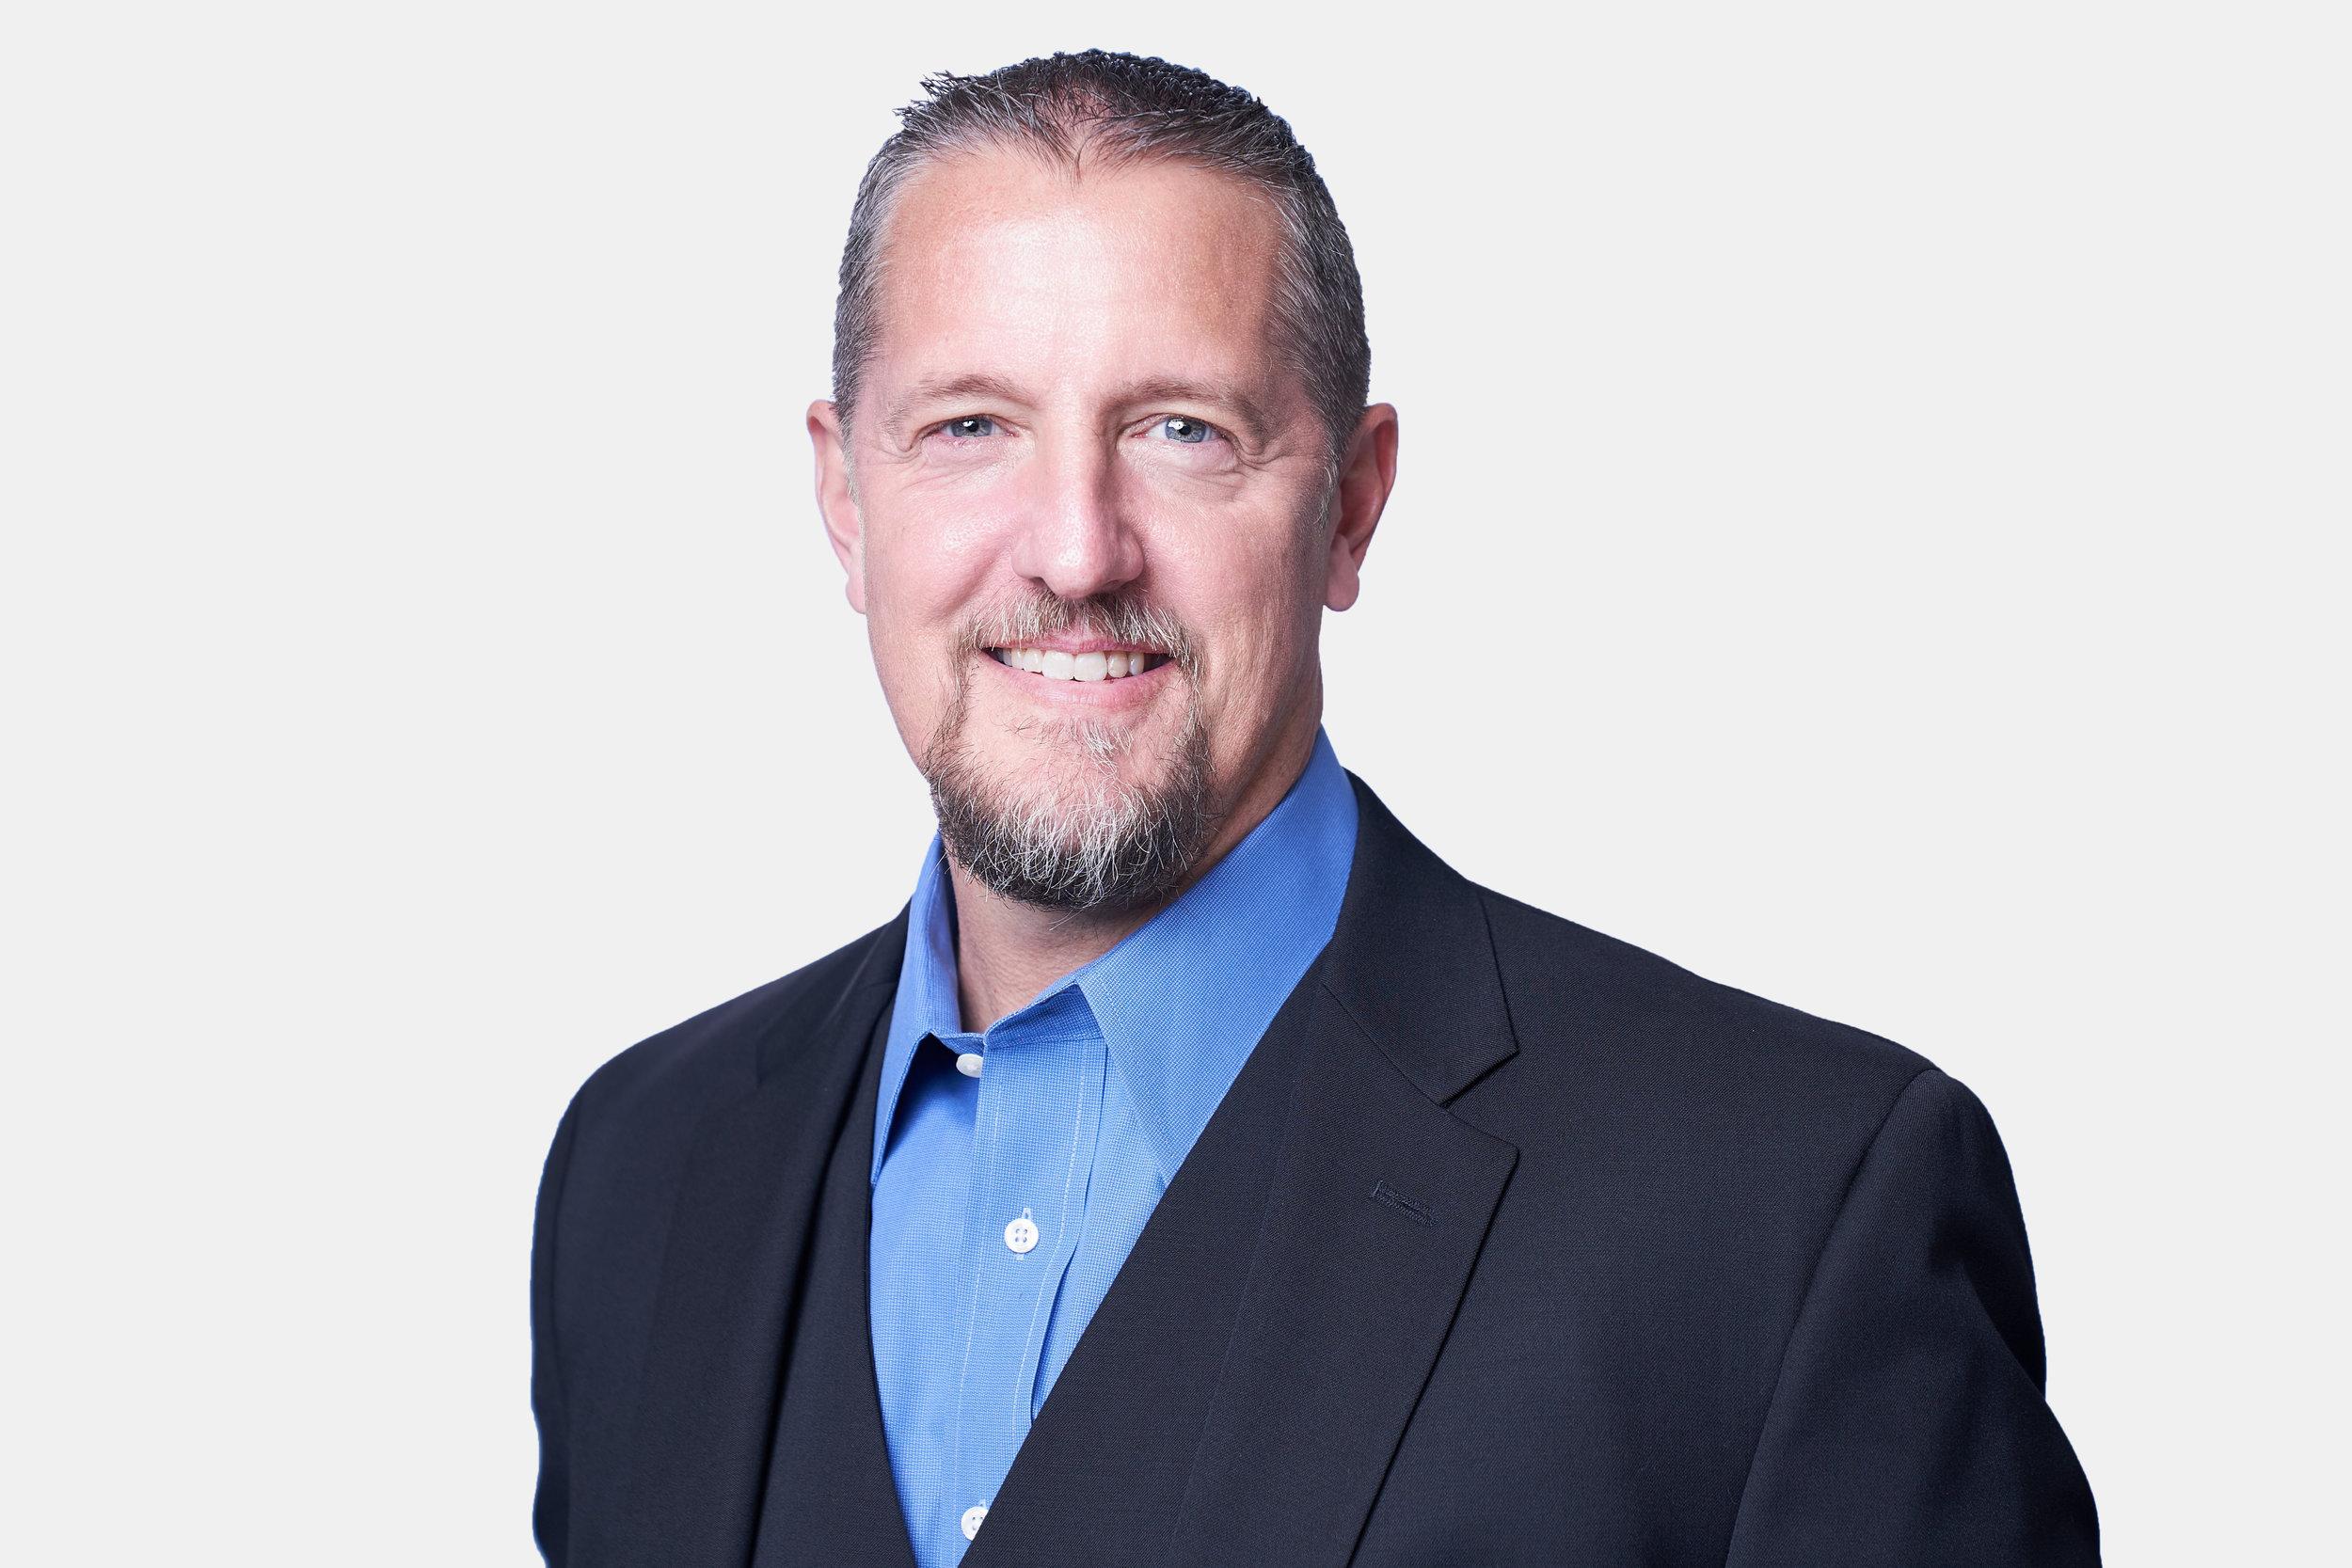 Carl Schirtzinger - PRESIDENT/CEO